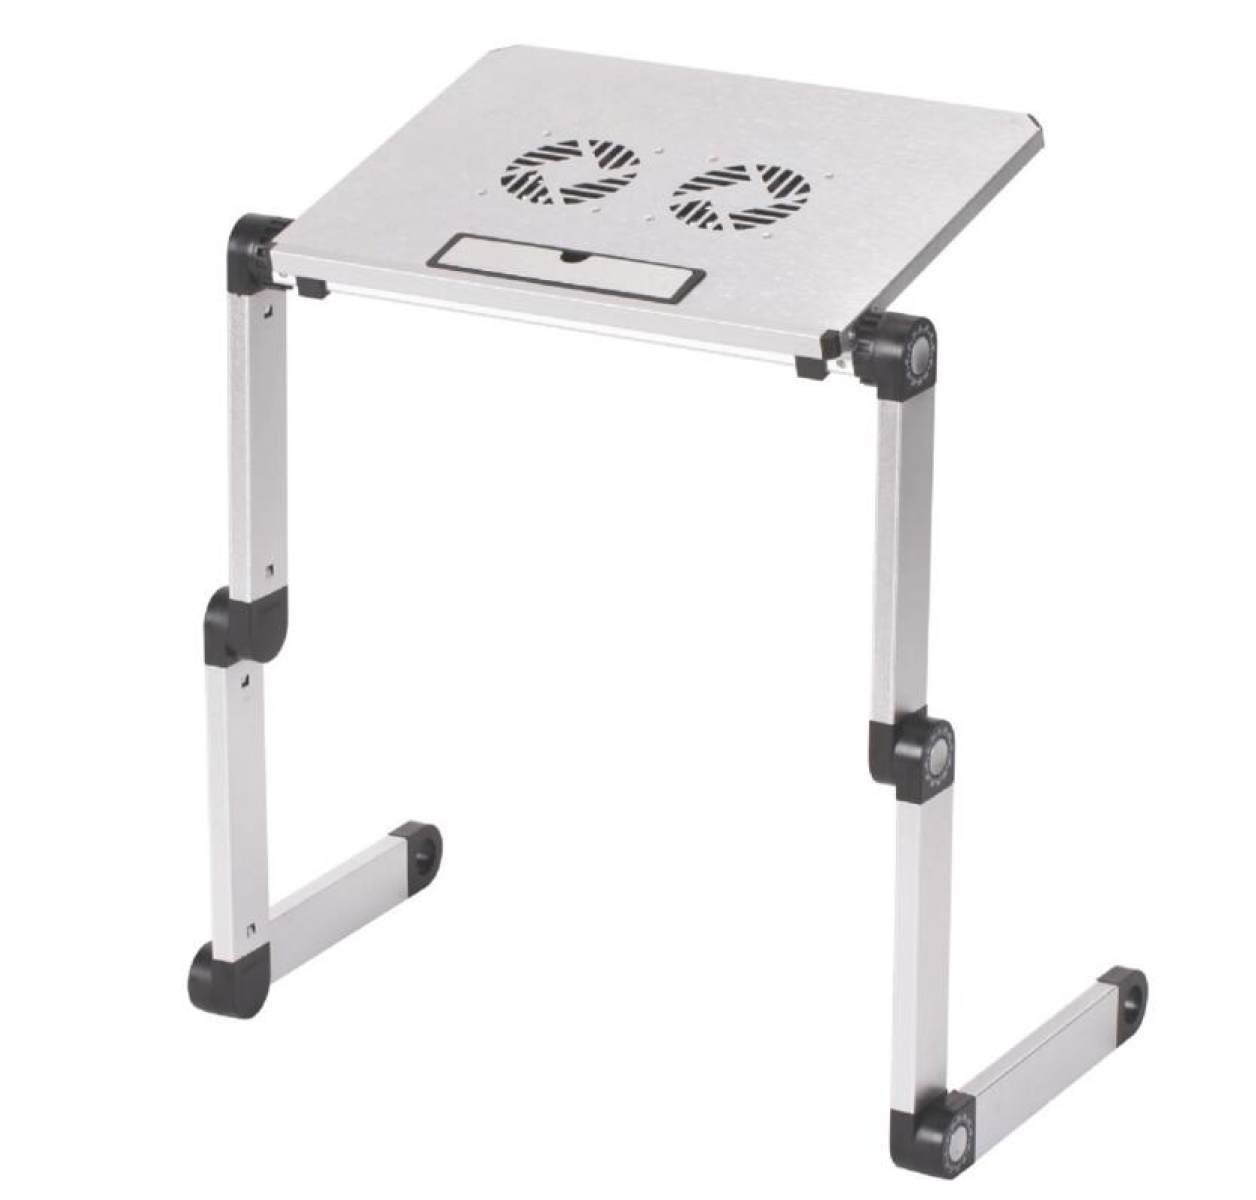 Laptop Table Aluminum Computer Desk Folding Table Bed Computer Tables Children 's Table Bed Bed Tray Gifts,White-OneSize